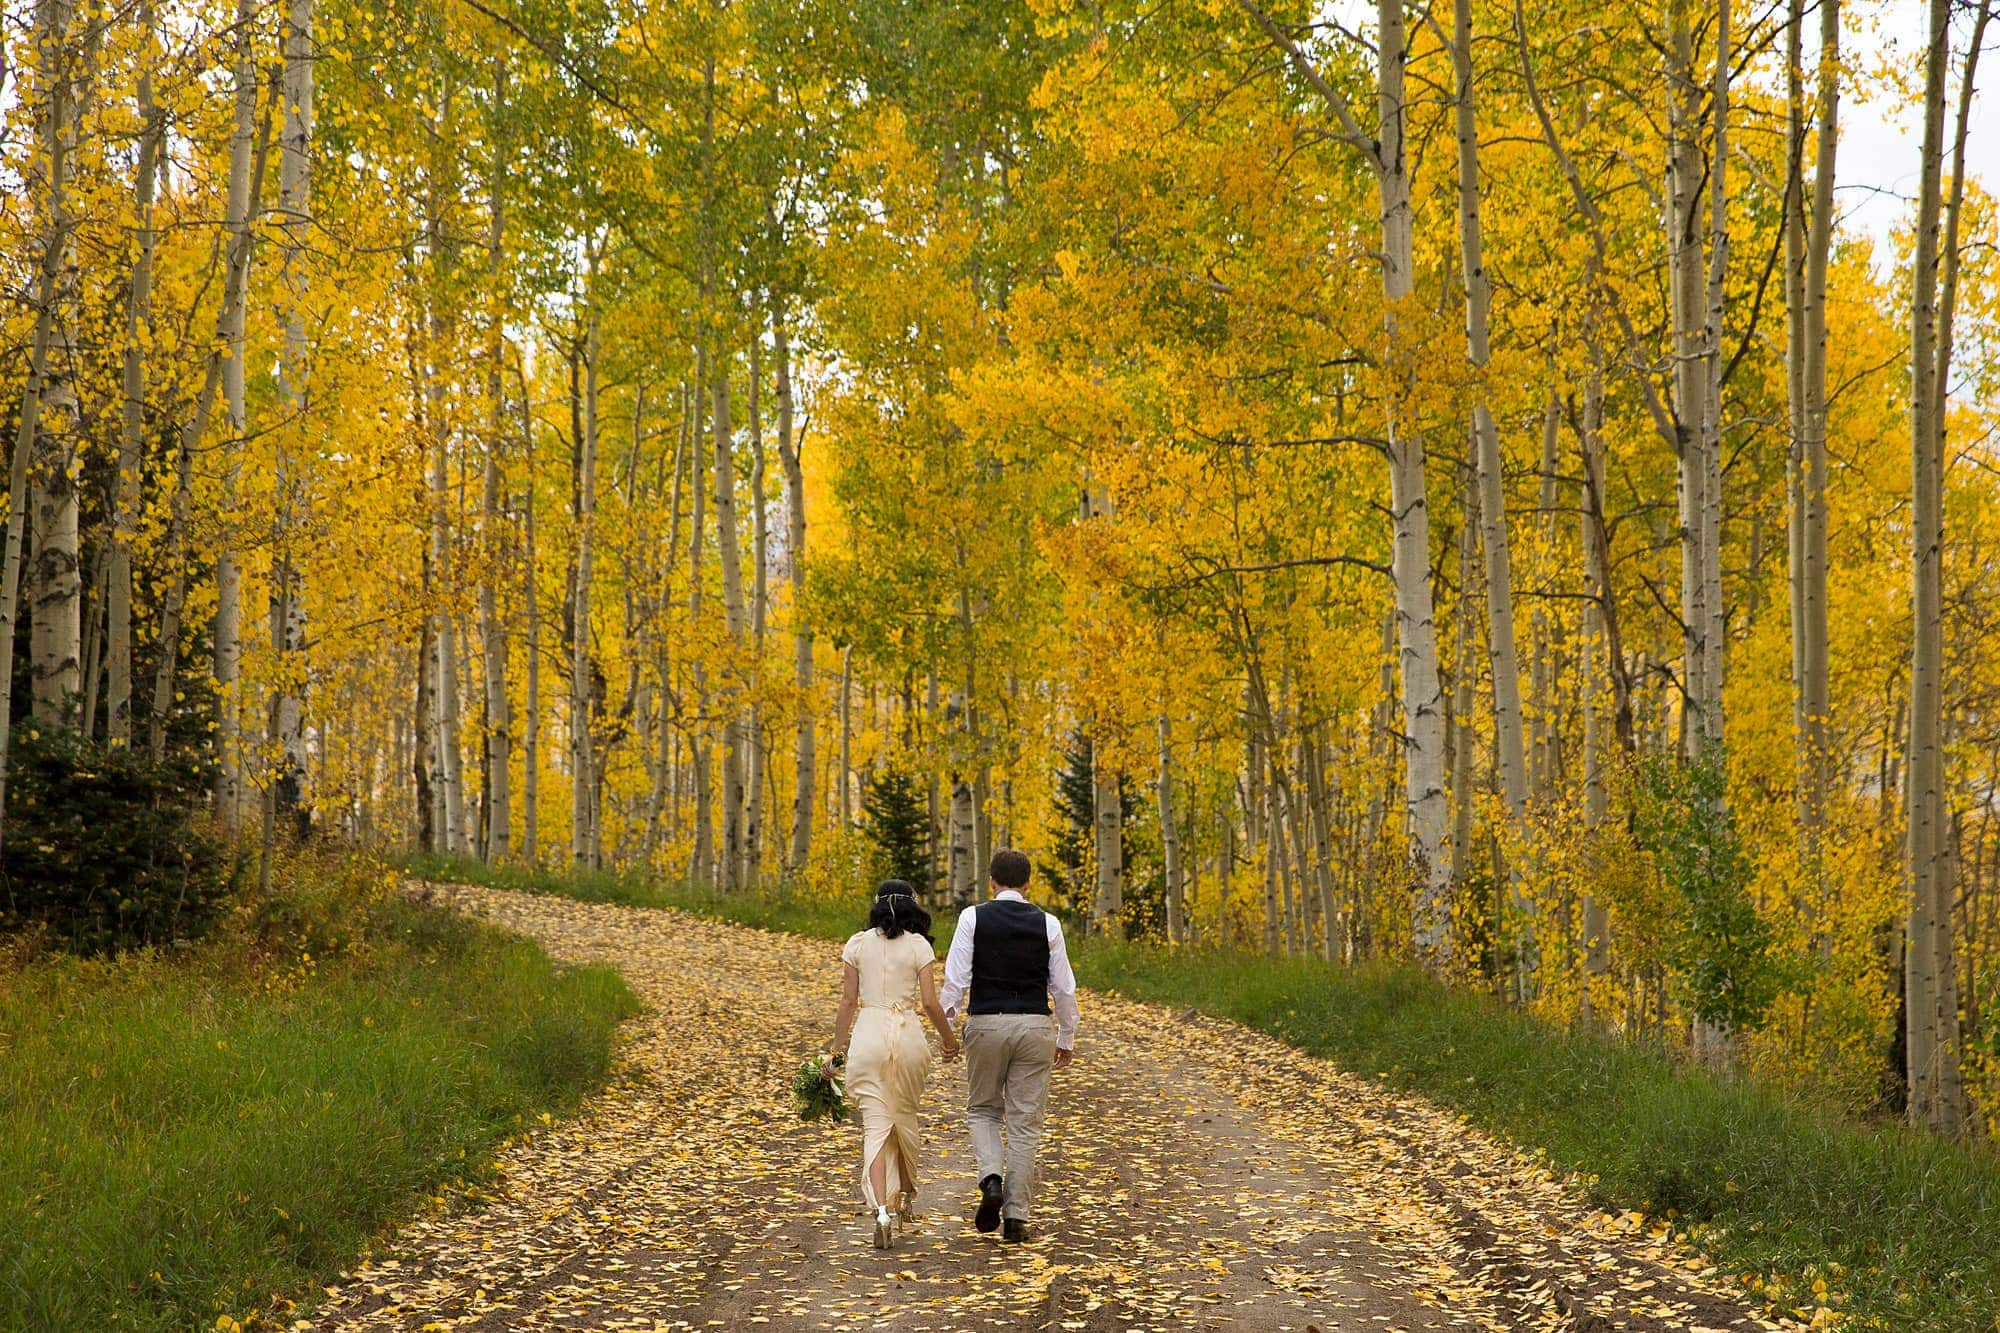 Allison and Walker walk down a road covered in yellow aspen leaves after their Lynn Britt Cabin wedding in Snowmass Village near Aspen, Colorado.